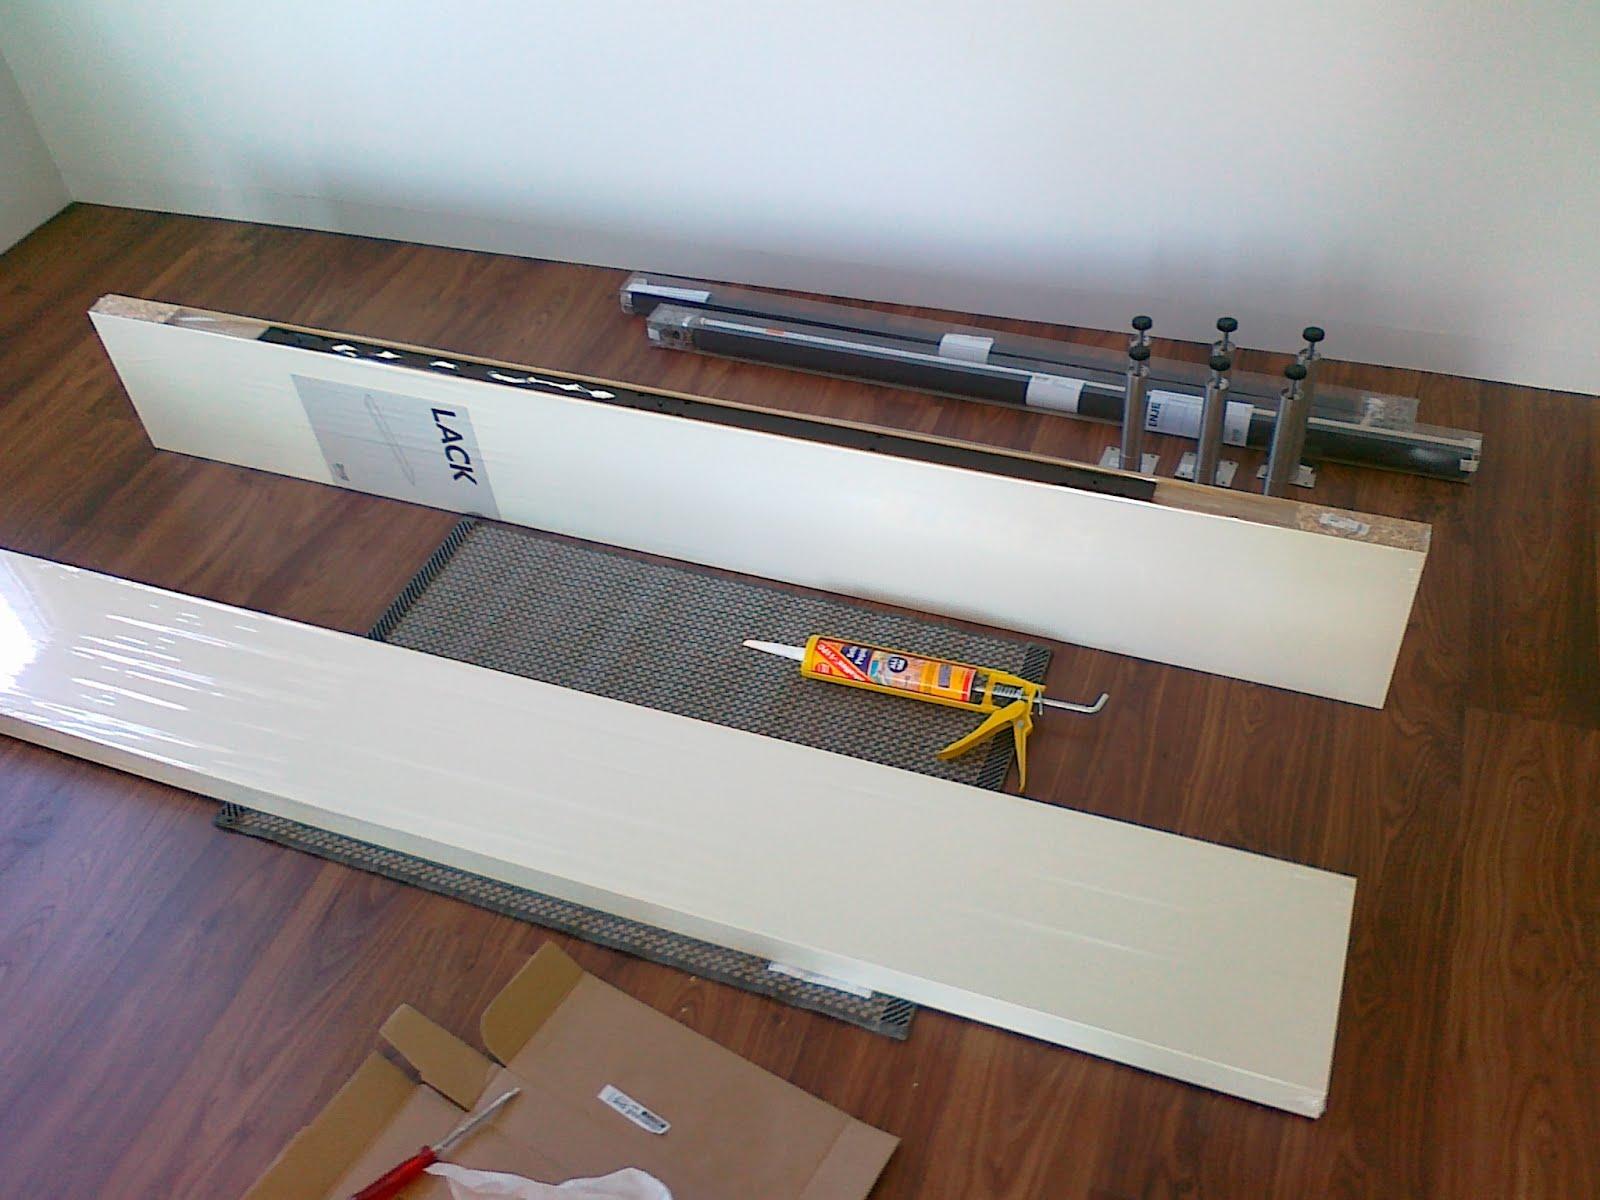 Ikea Lack Shelf Hack Lack Shelf Into Minimalist Media Stand Ikea Hackers Ikea Hackers